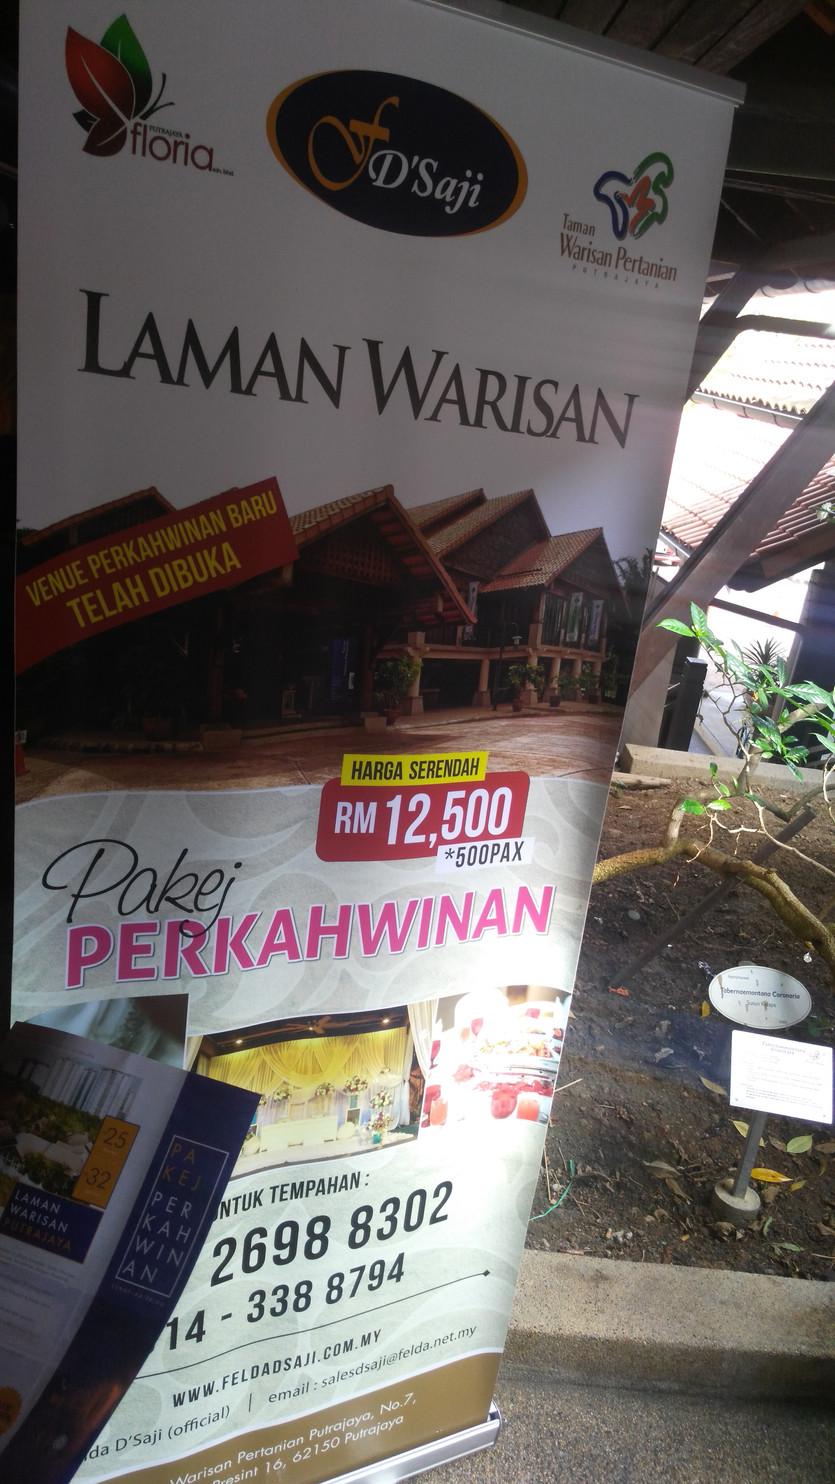 Kahwin di Taman Warisan Putrajaya?